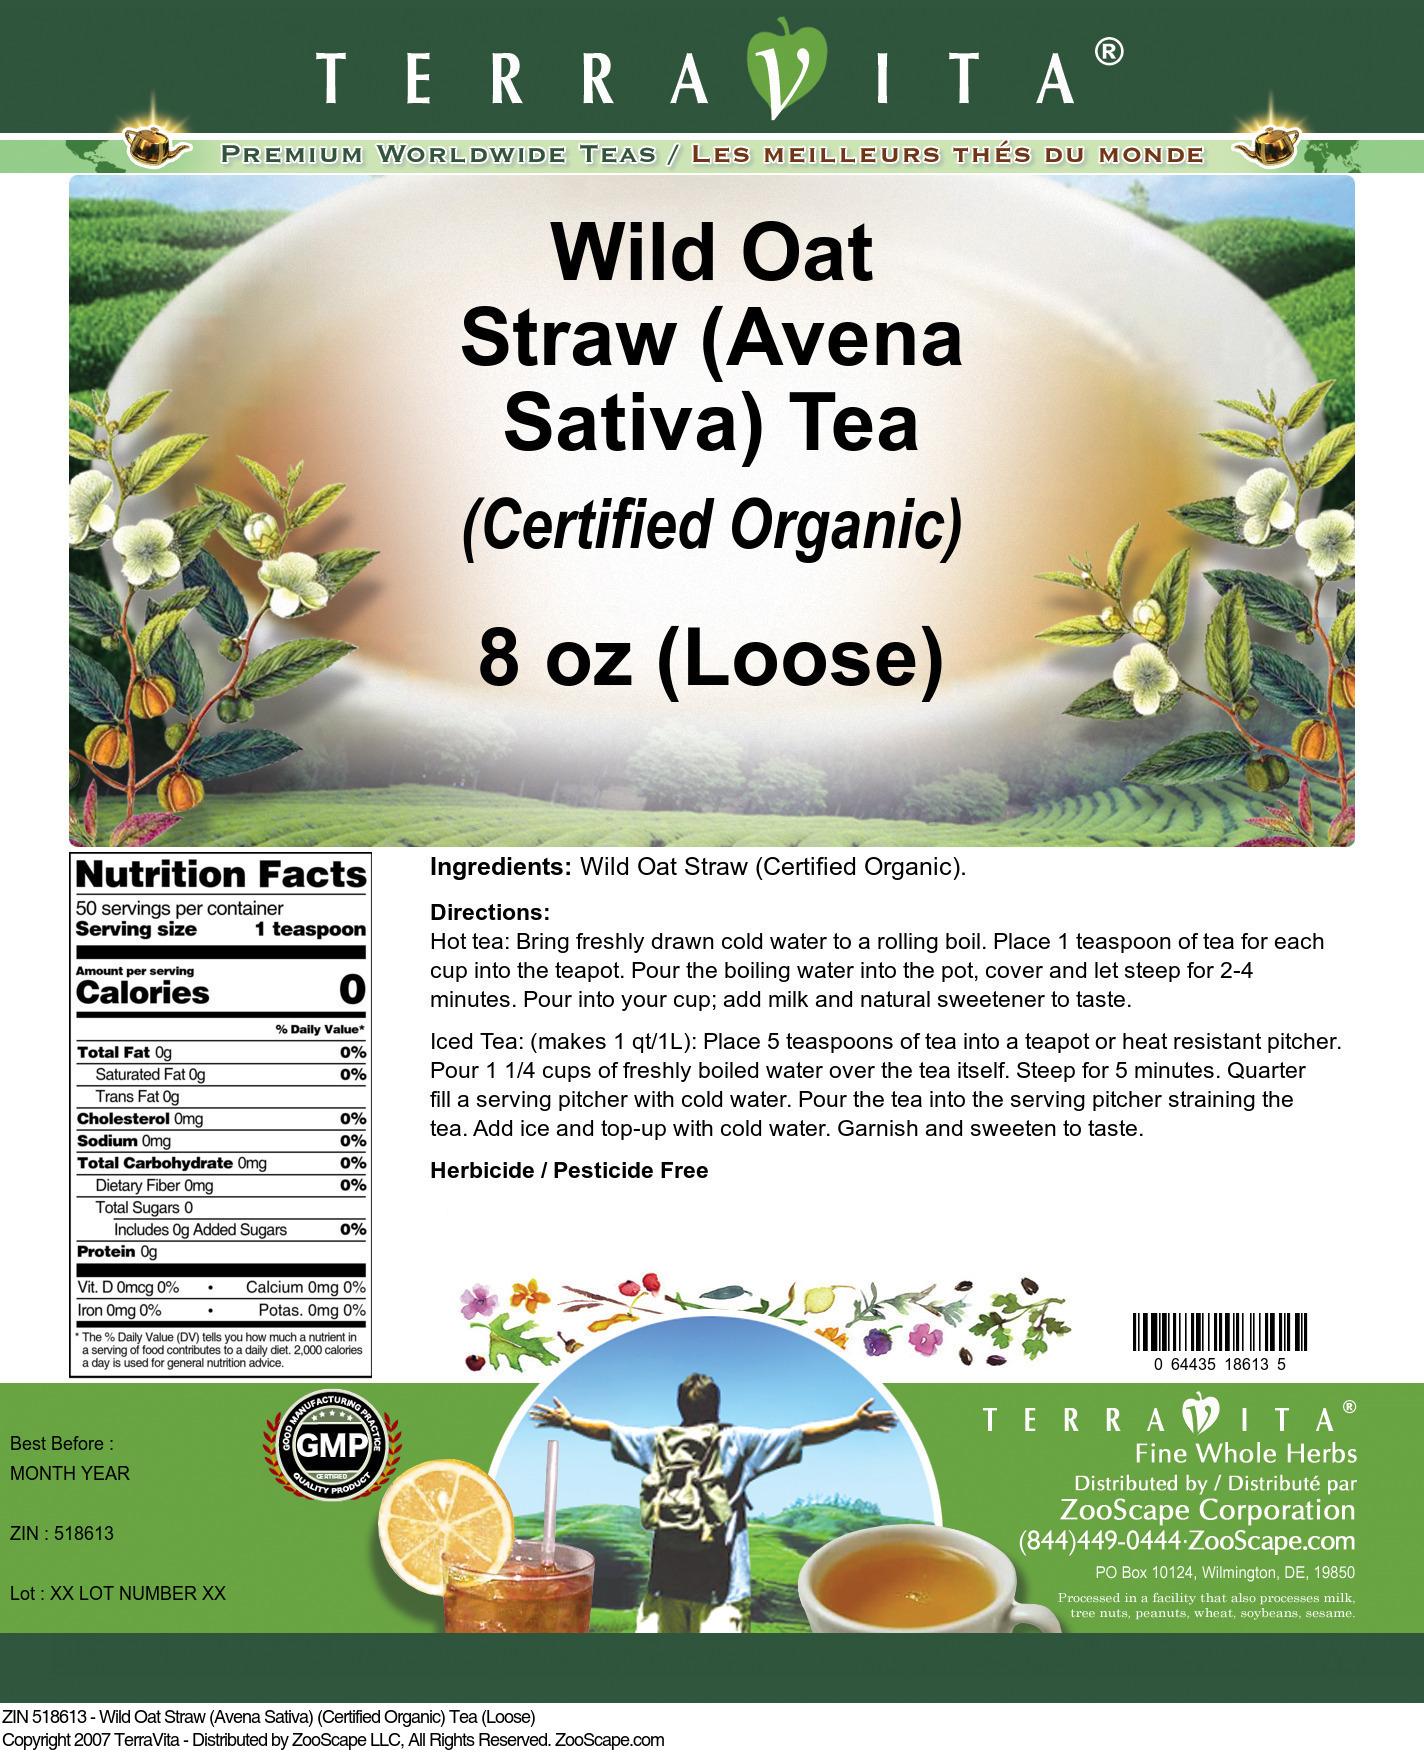 Wild Oat Straw (Avena Sativa) (Certified Organic) Tea (Loose)